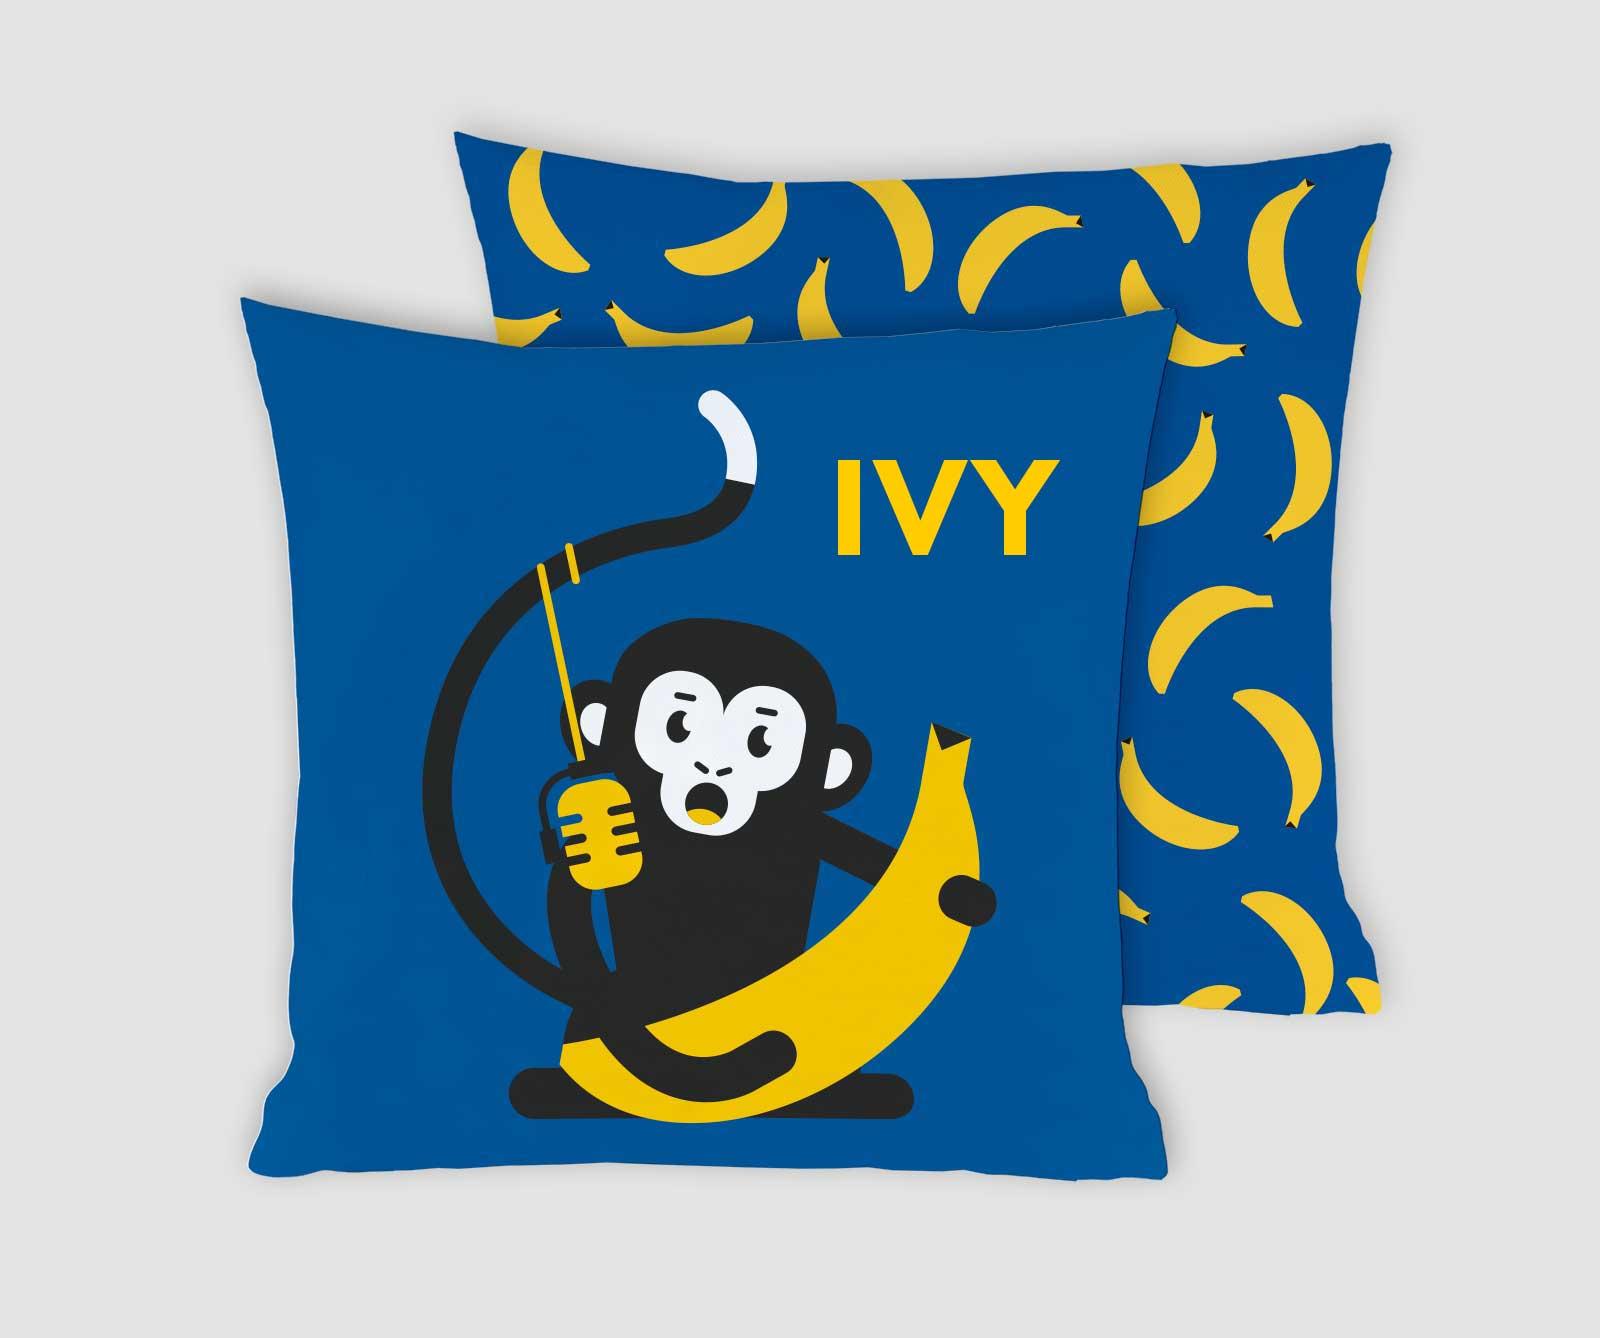 Kussenhoes Daddy Cool gepersonaliseerd kraamcadeau met naam aapje blauw